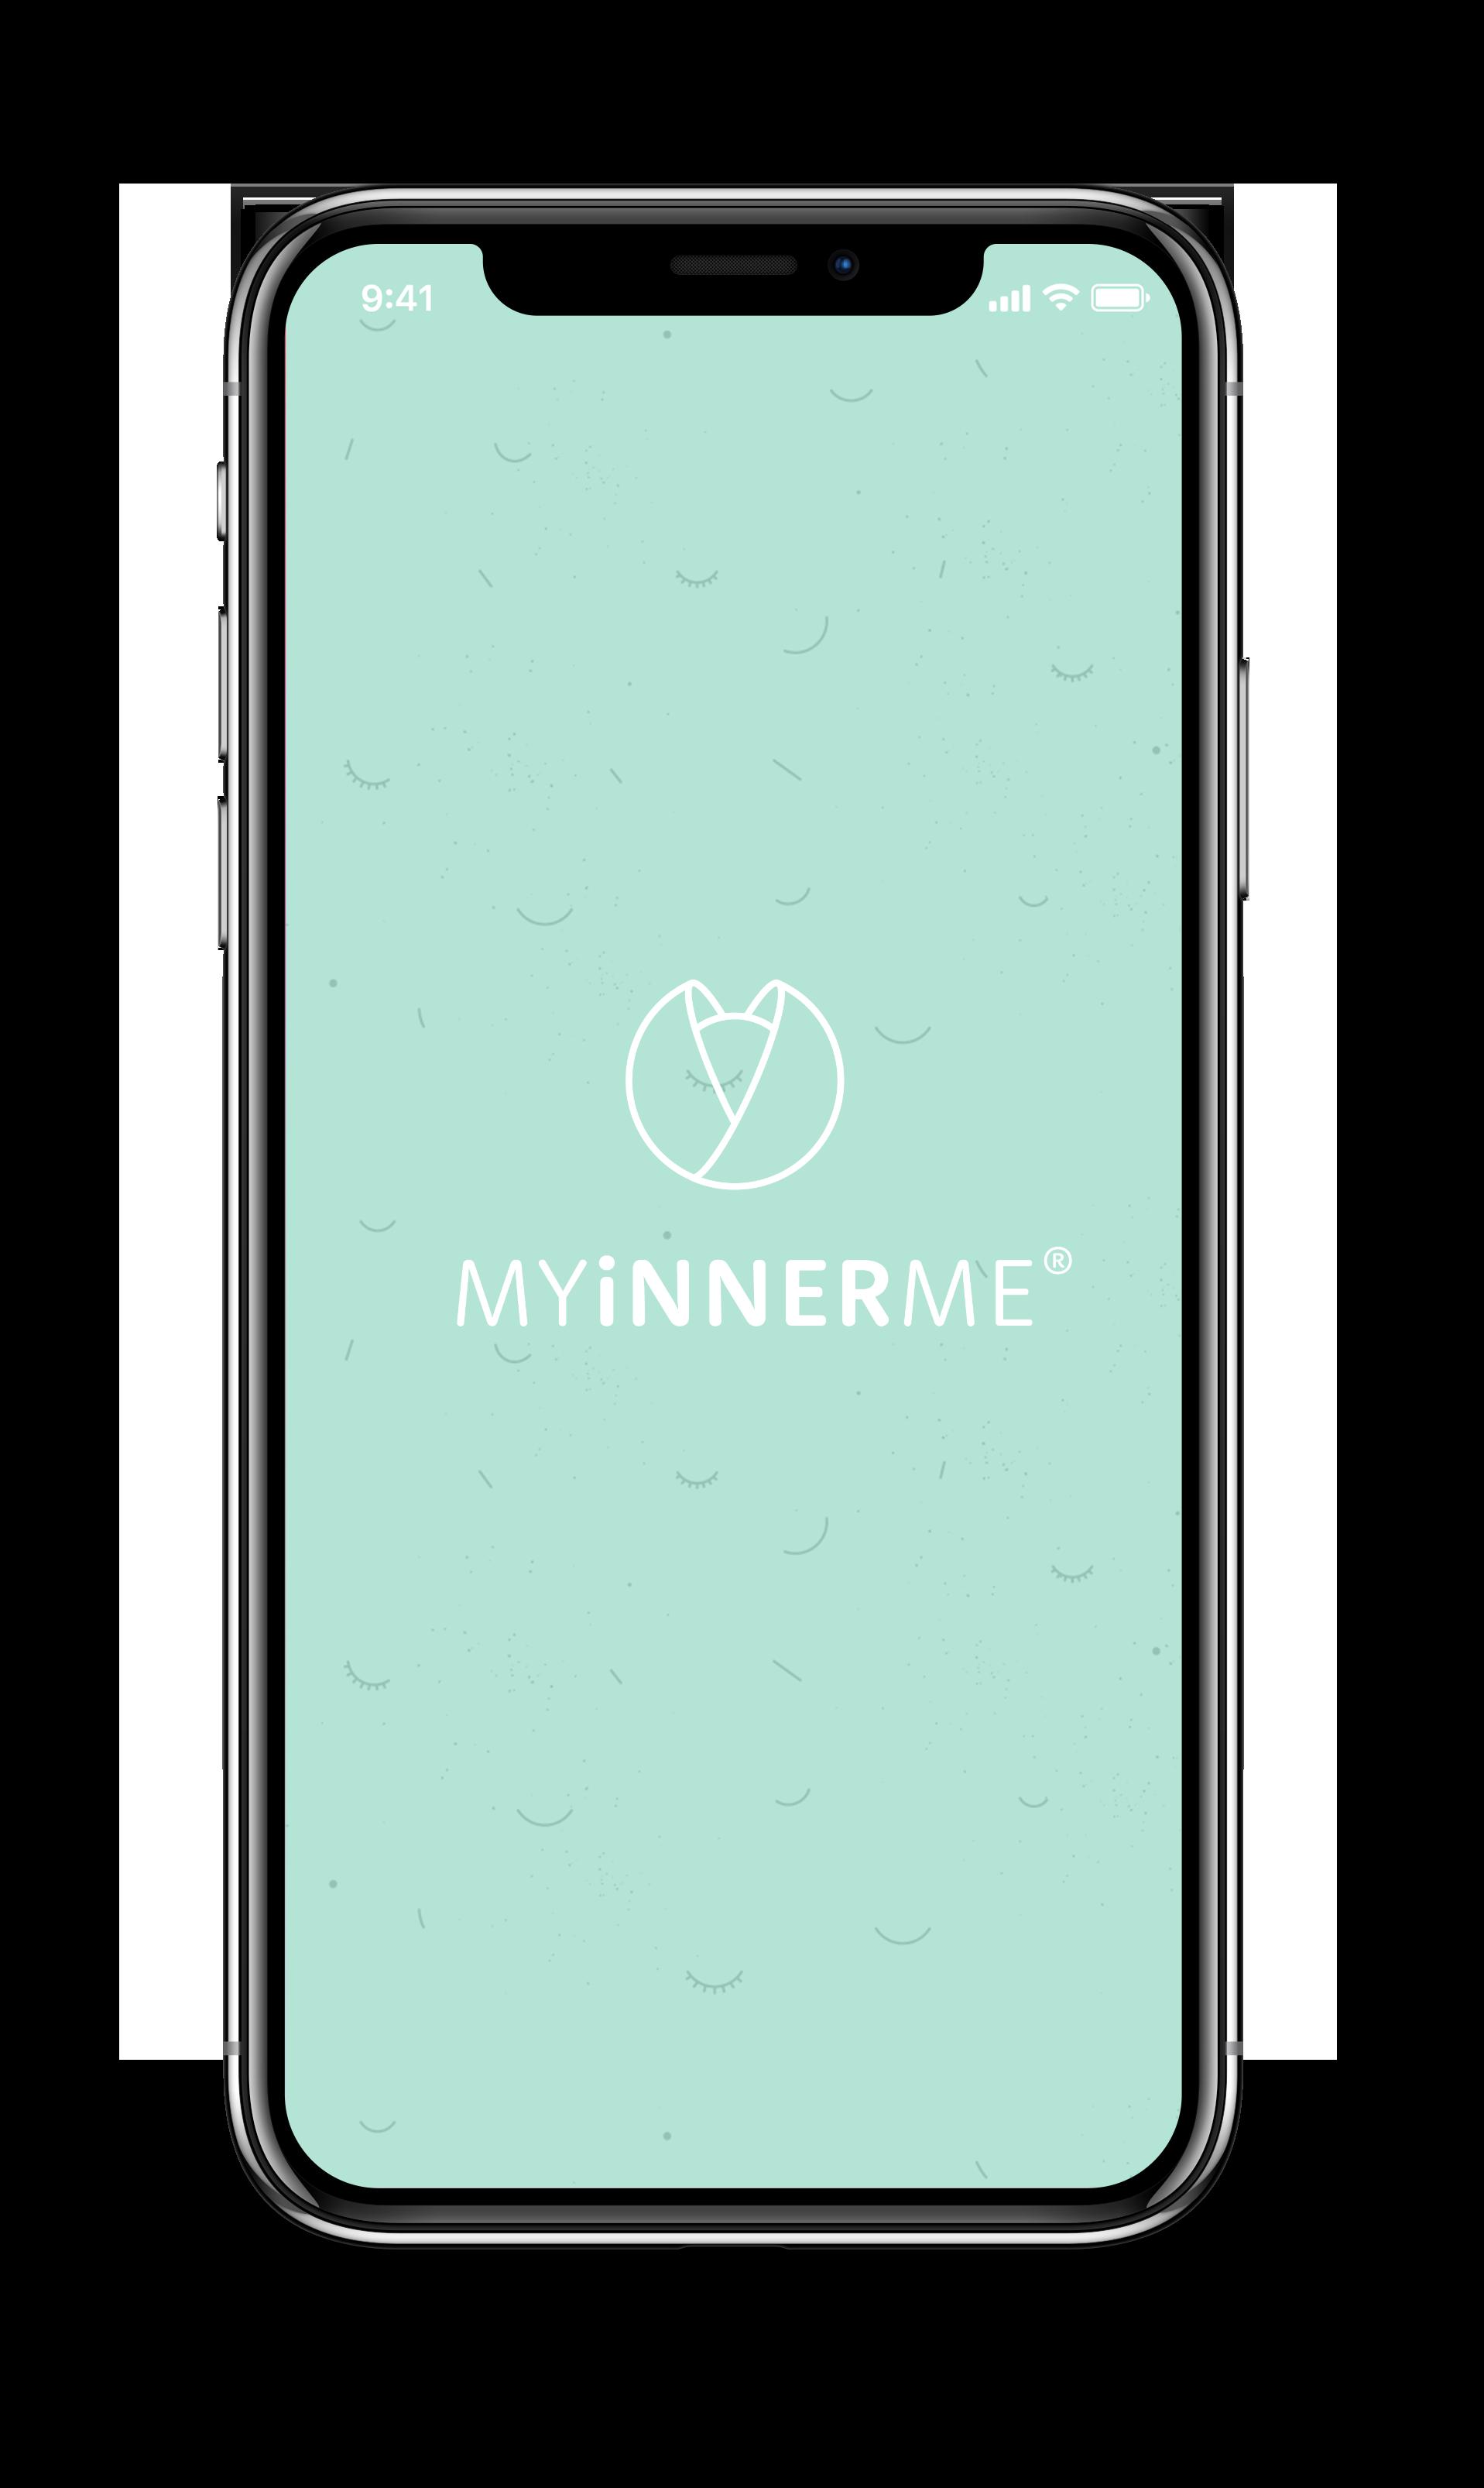 MYiNNERME